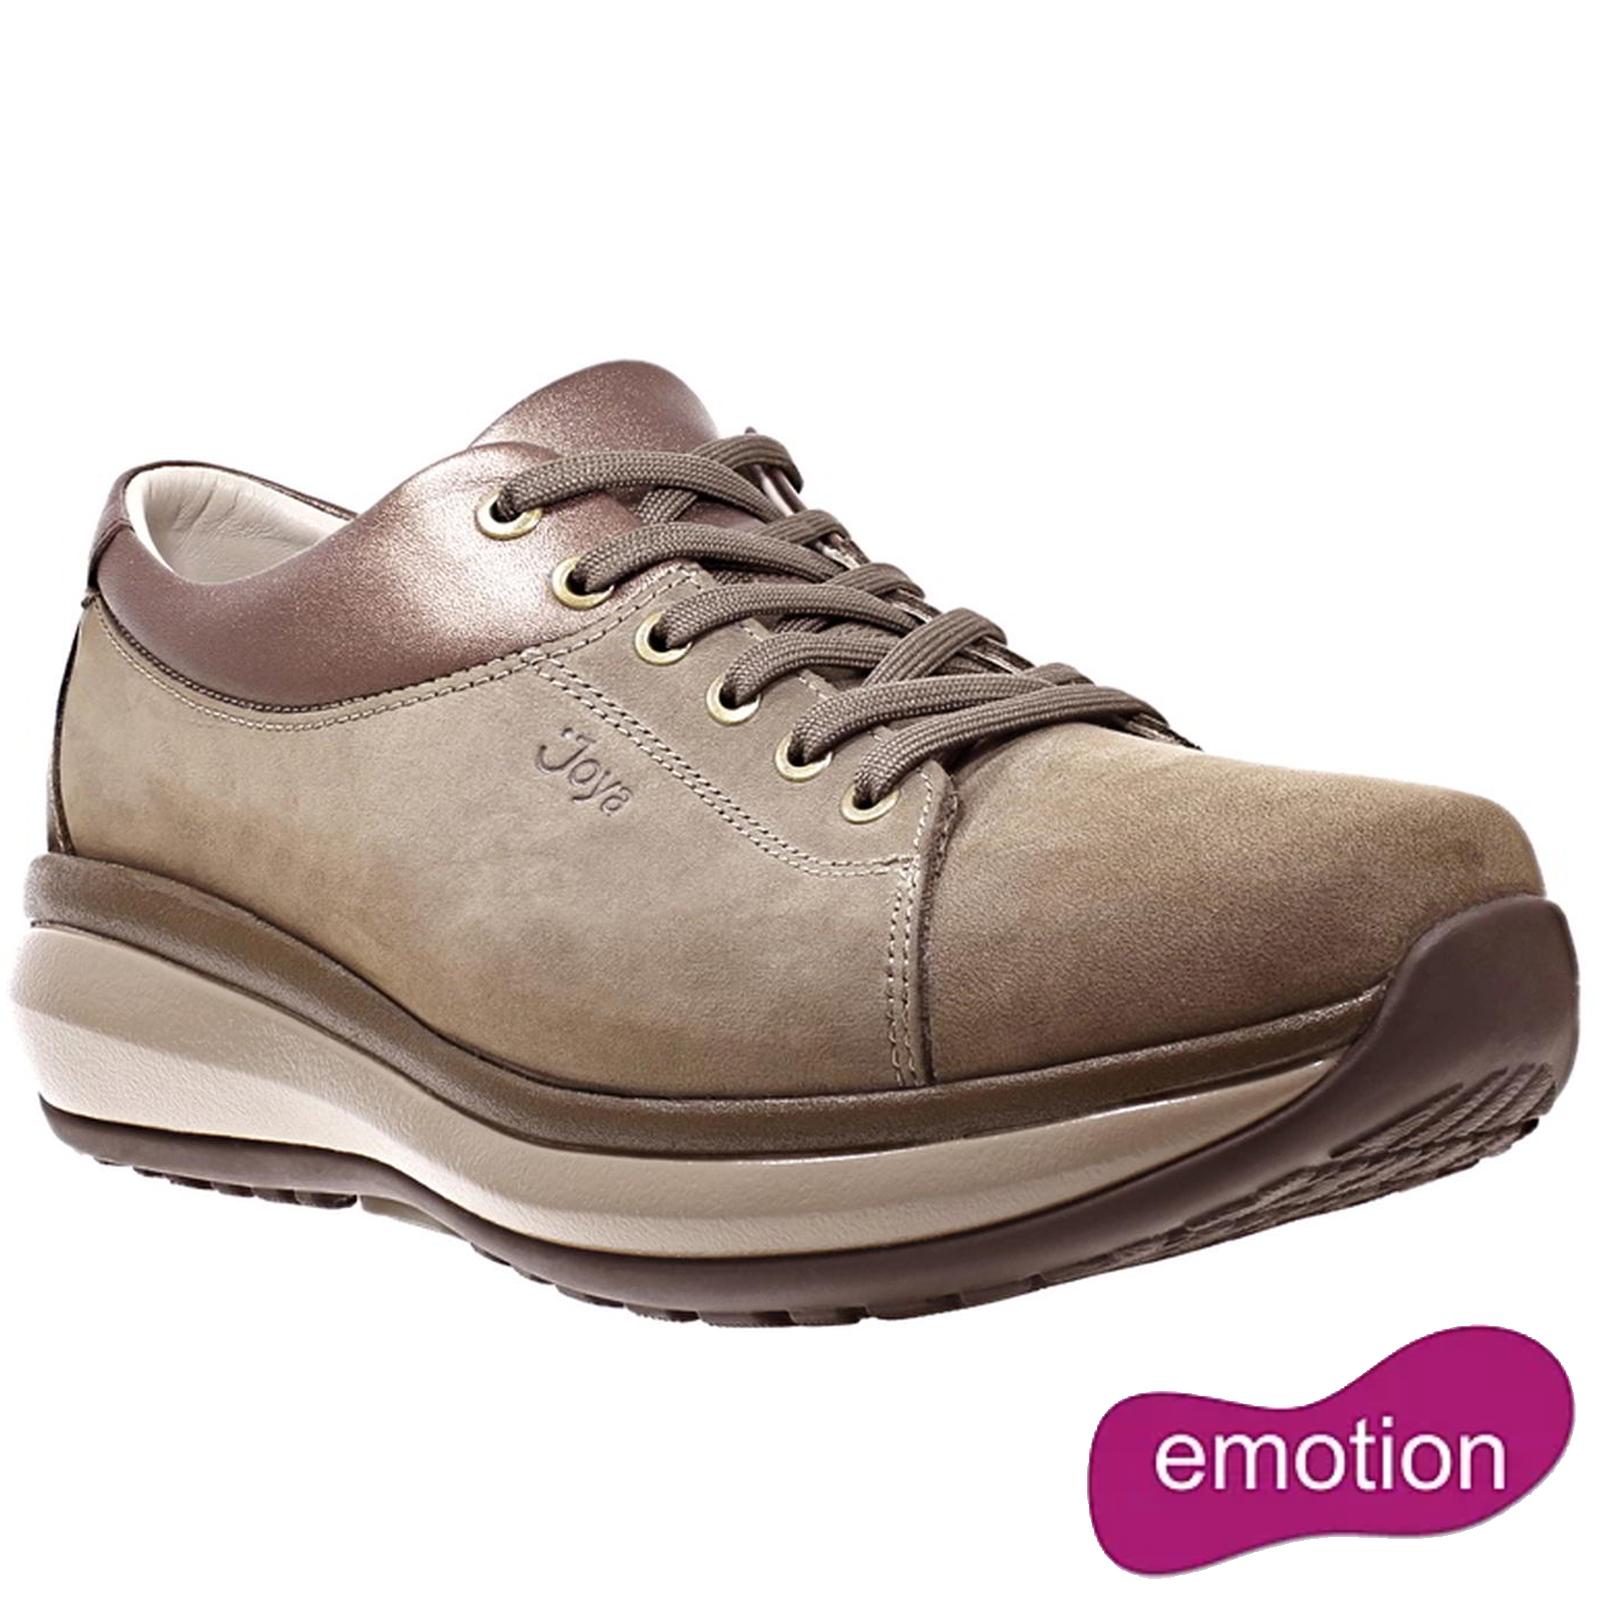 Joya Womens Athena Leather Shoes - Teak